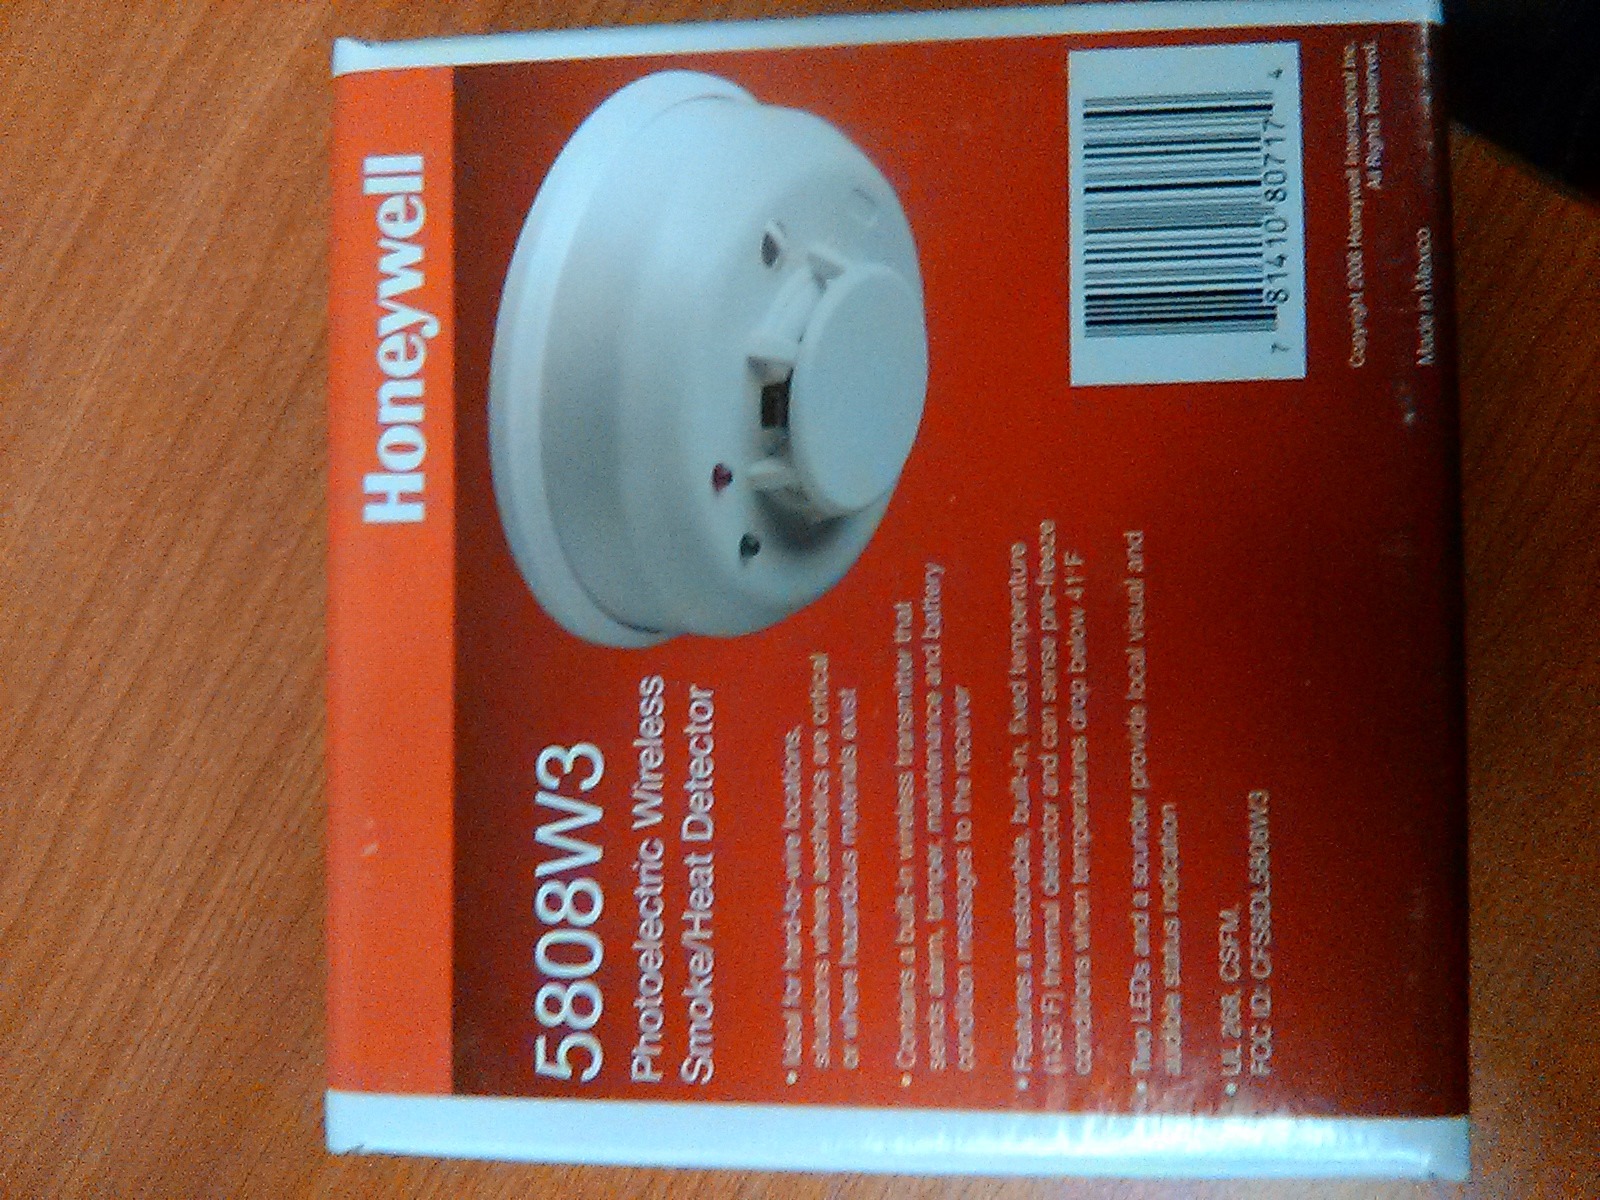 Honeywell 5808W3 Photoelectric  Wireless Smoke/Heat Detector